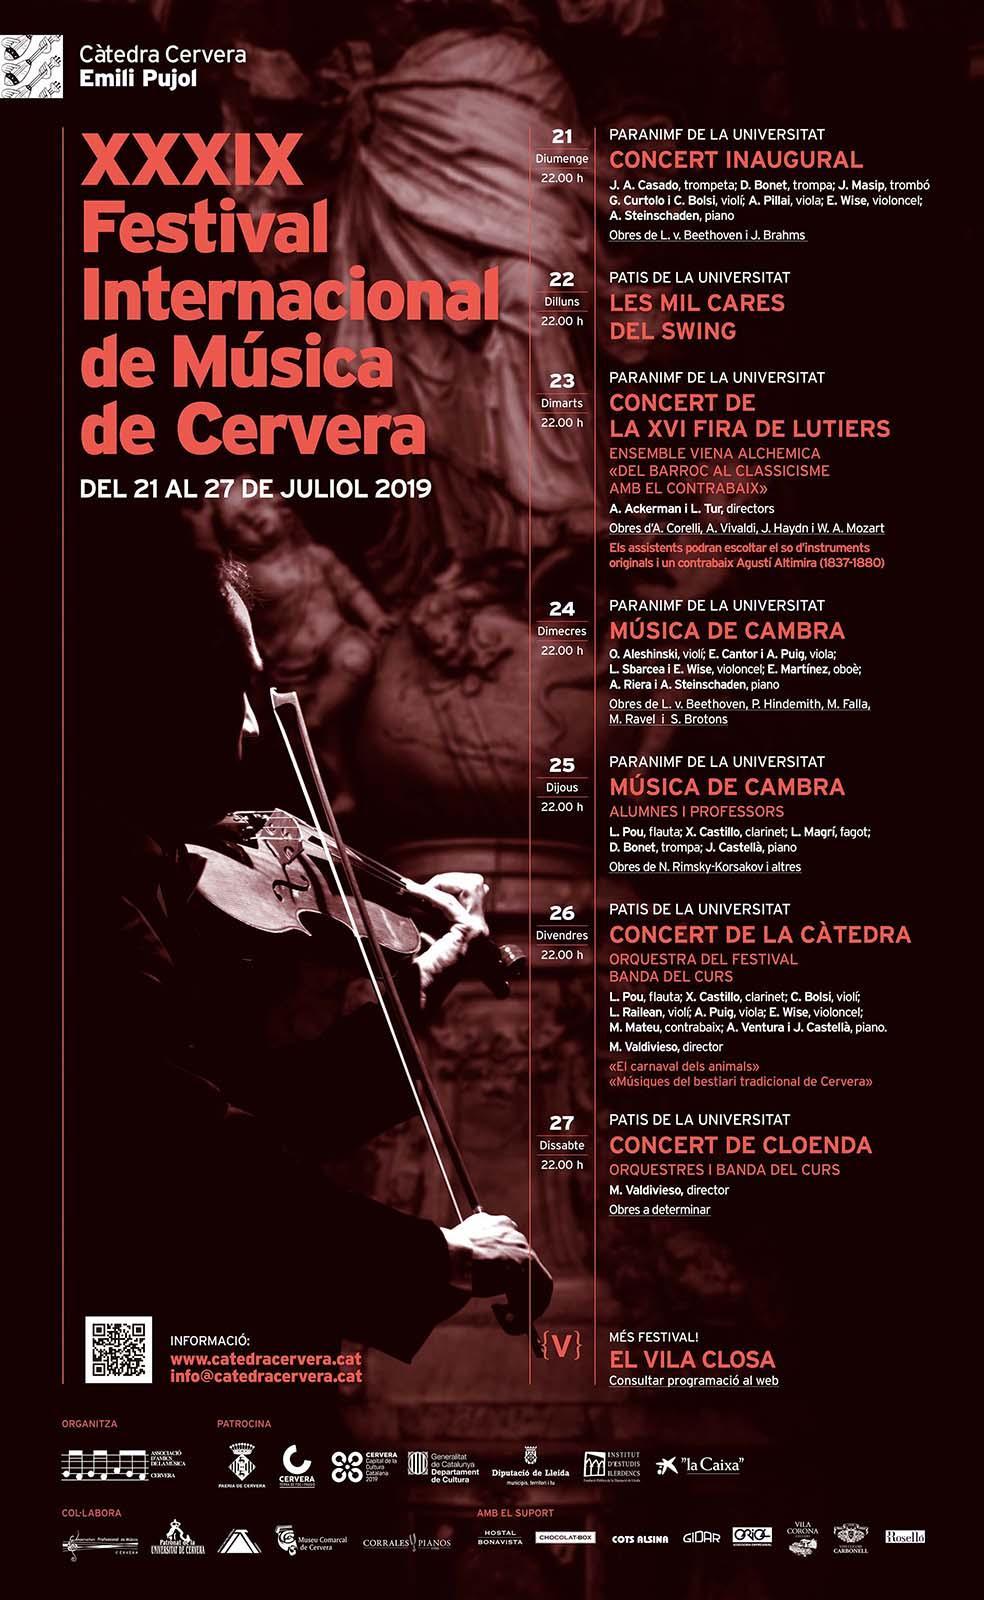 XXXIX Festival Internacional de Música